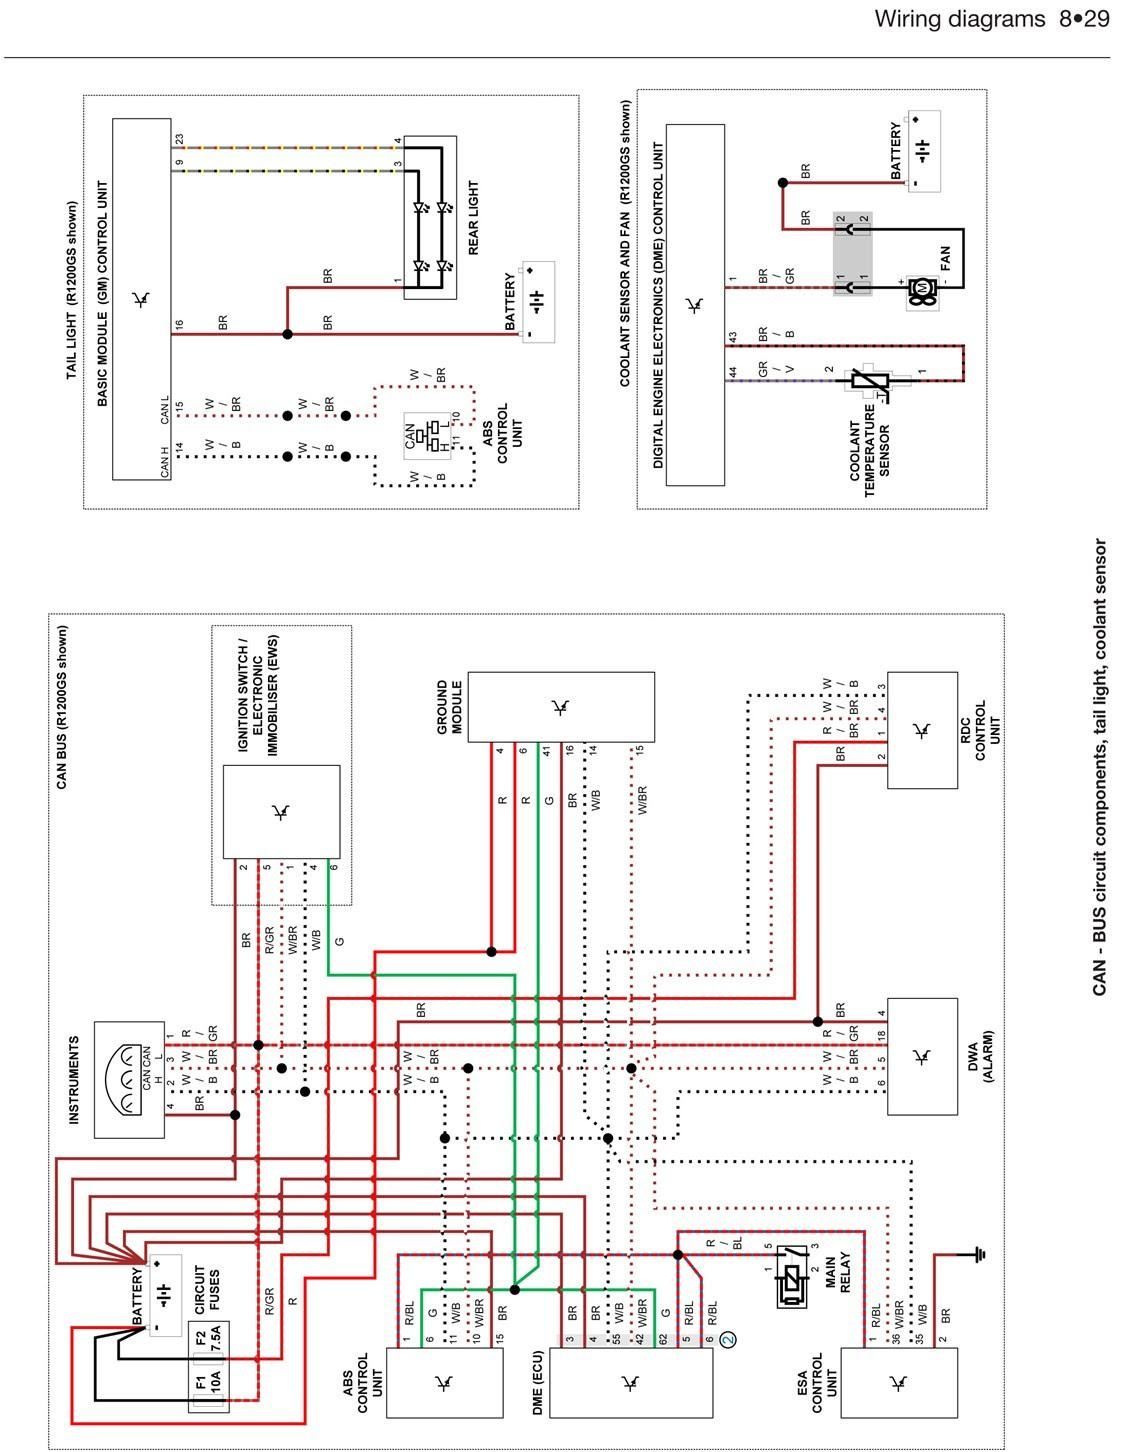 Bmw R 1200 Wiring Diagram 1984 Gmc Jimmy Wiring Diagram Begeboy Wiring Diagram Source